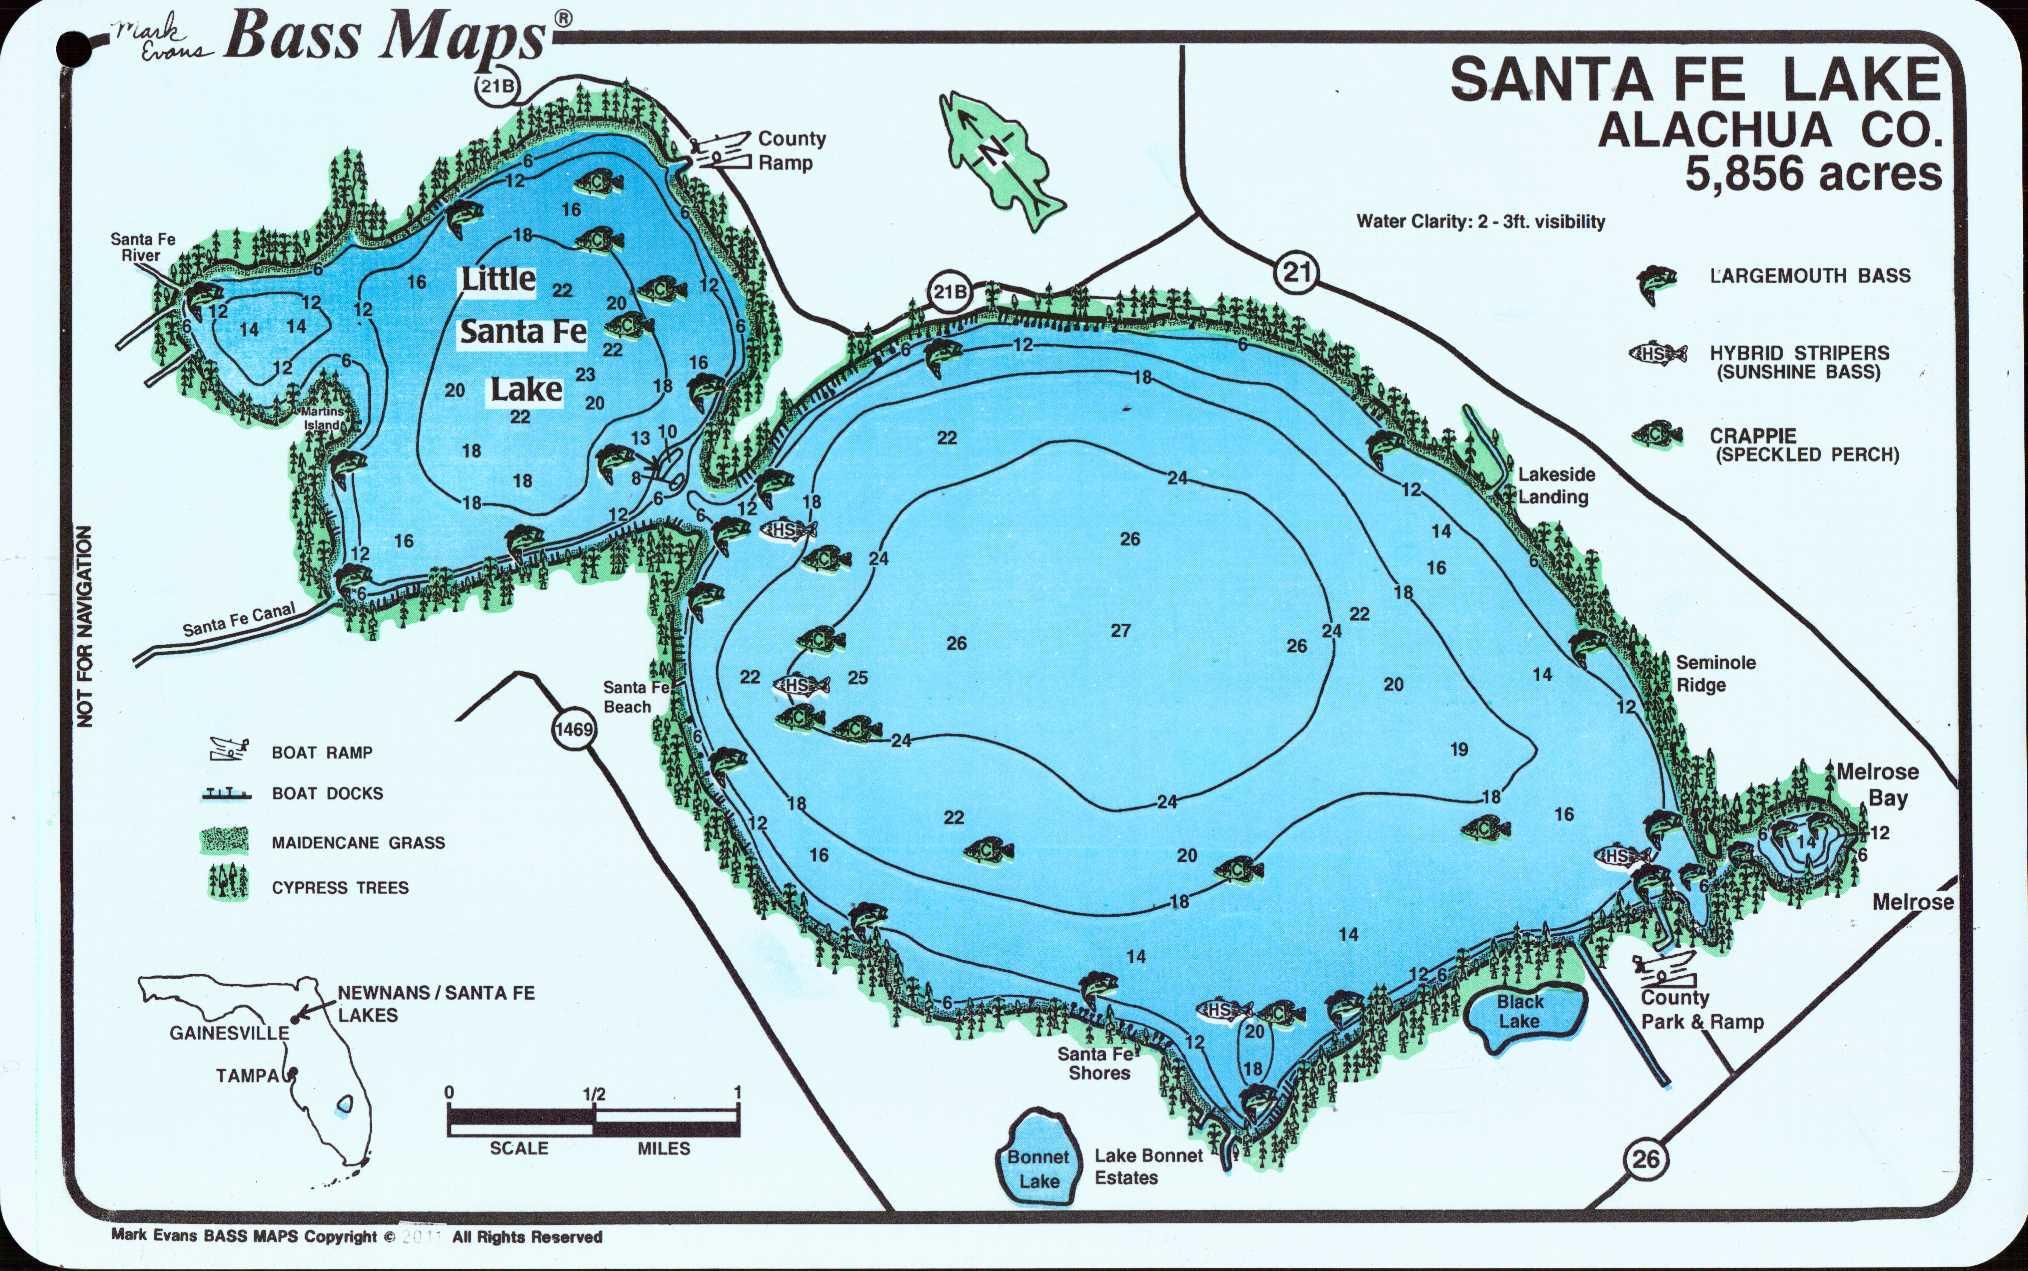 Lakes Newnan's / Sante Fe (2 Sided Map) - Mark Evans Maps - Florida Fishing Lakes Map